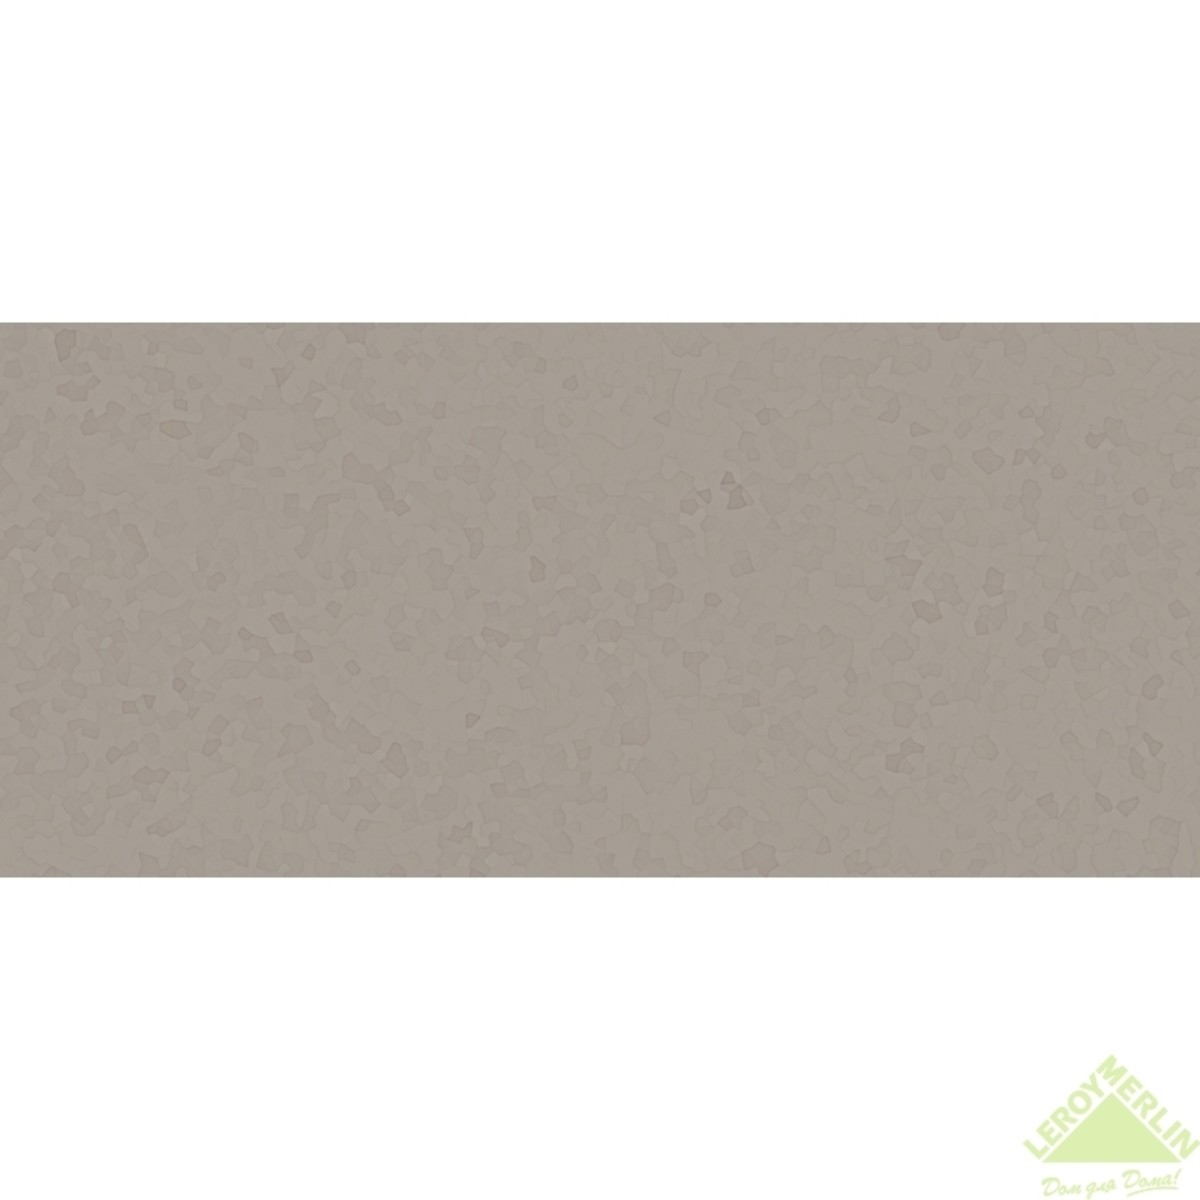 Плитка настенная Crystal (CUG011D) 20x44 см 105 м2